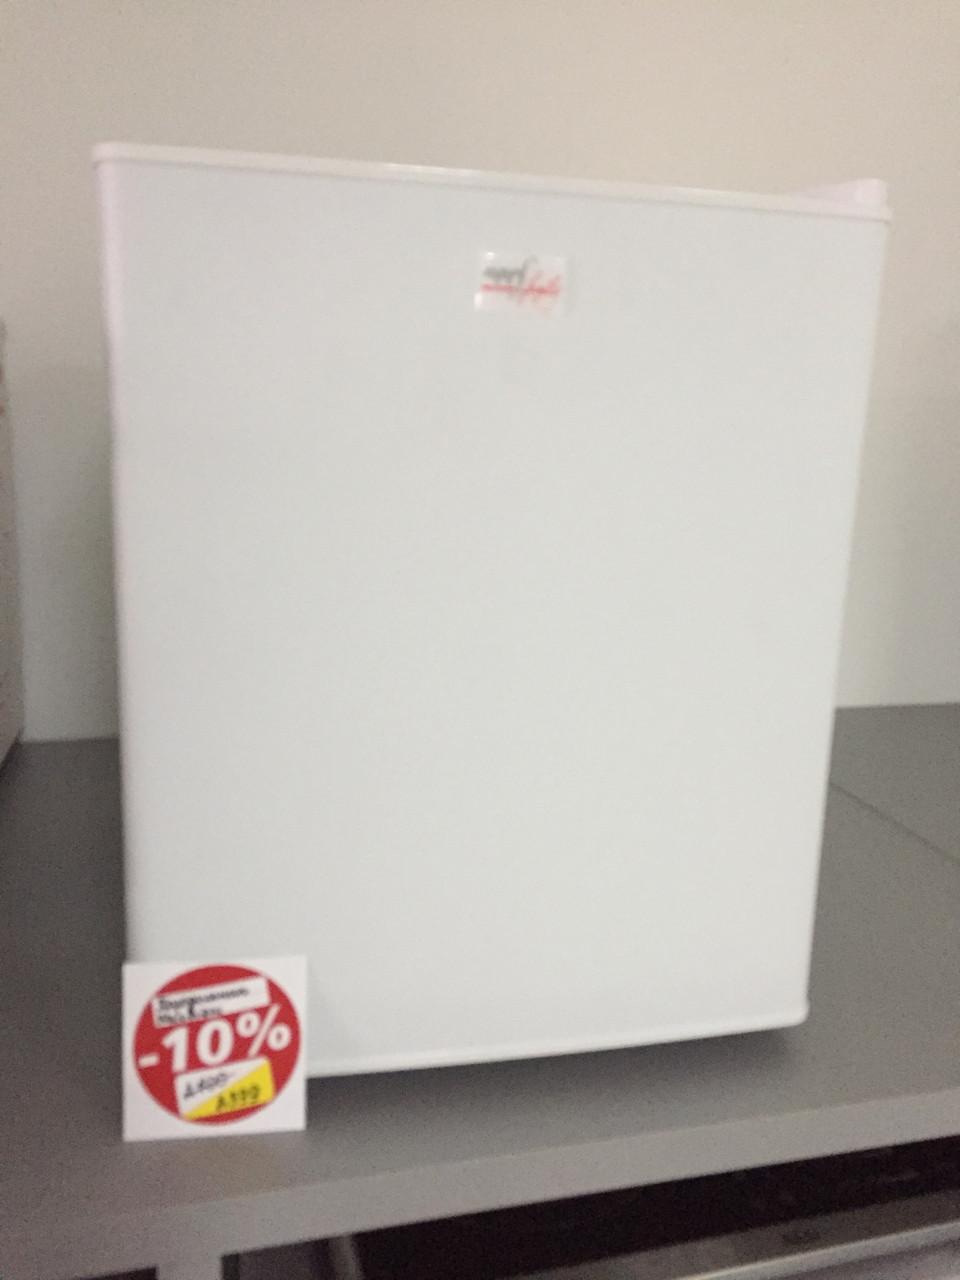 Міні-холодильник melchioni baretto